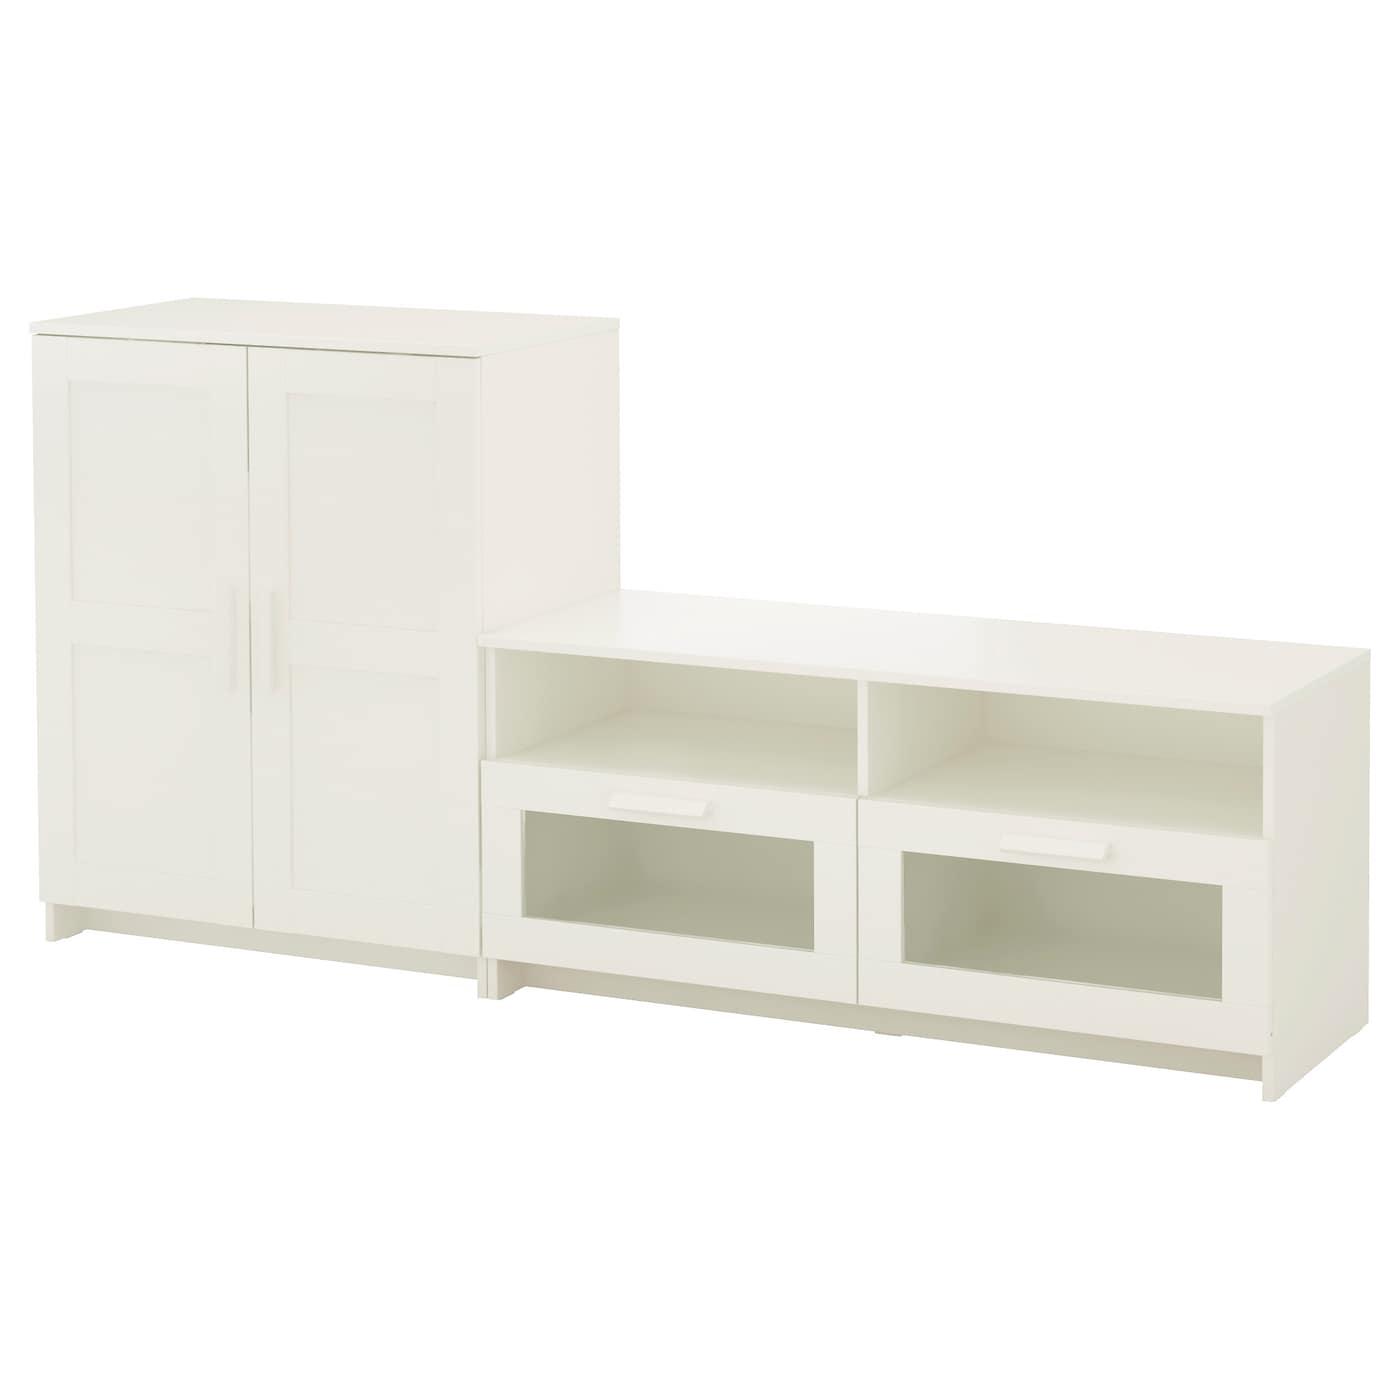 BRIMNES TV storage combination White 200x41x95 cm IKEA